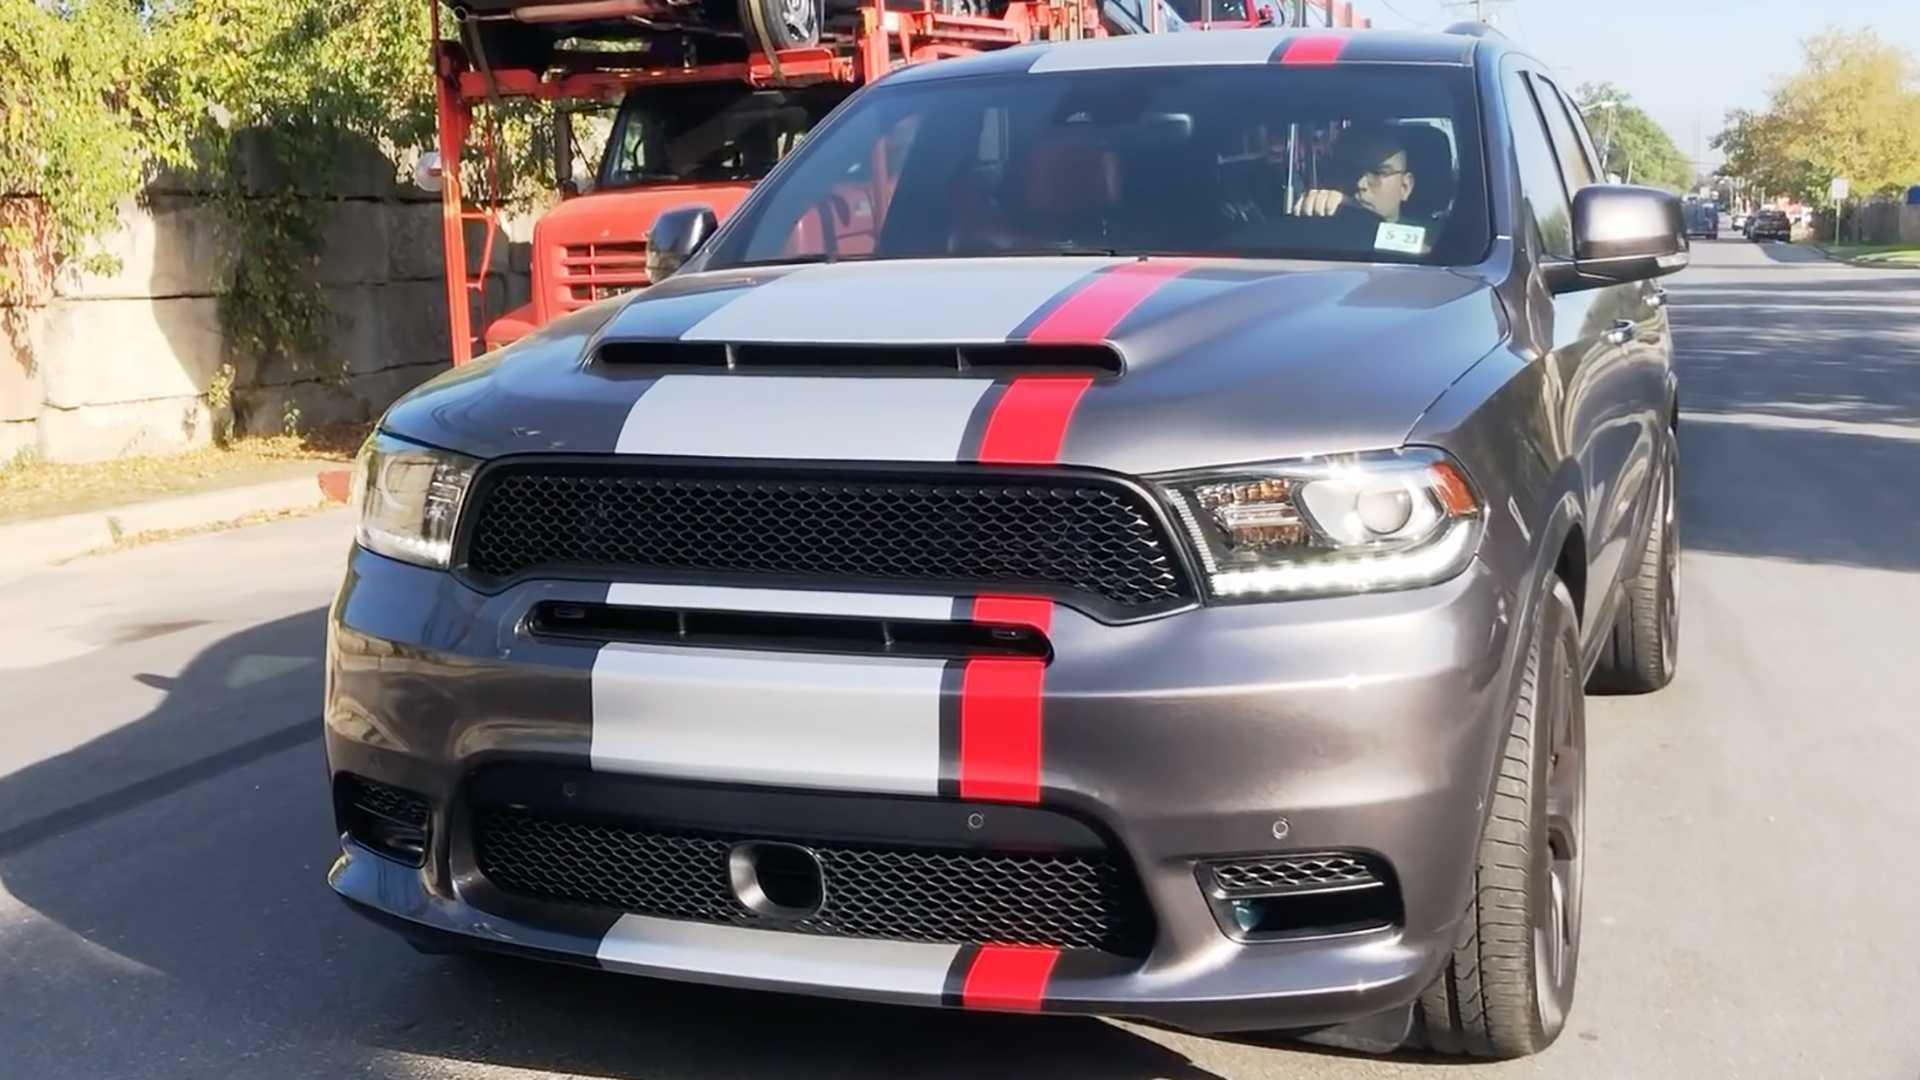 Dodge Durango Srt With Hellcat Engine And Demon Hood Looks Fierce